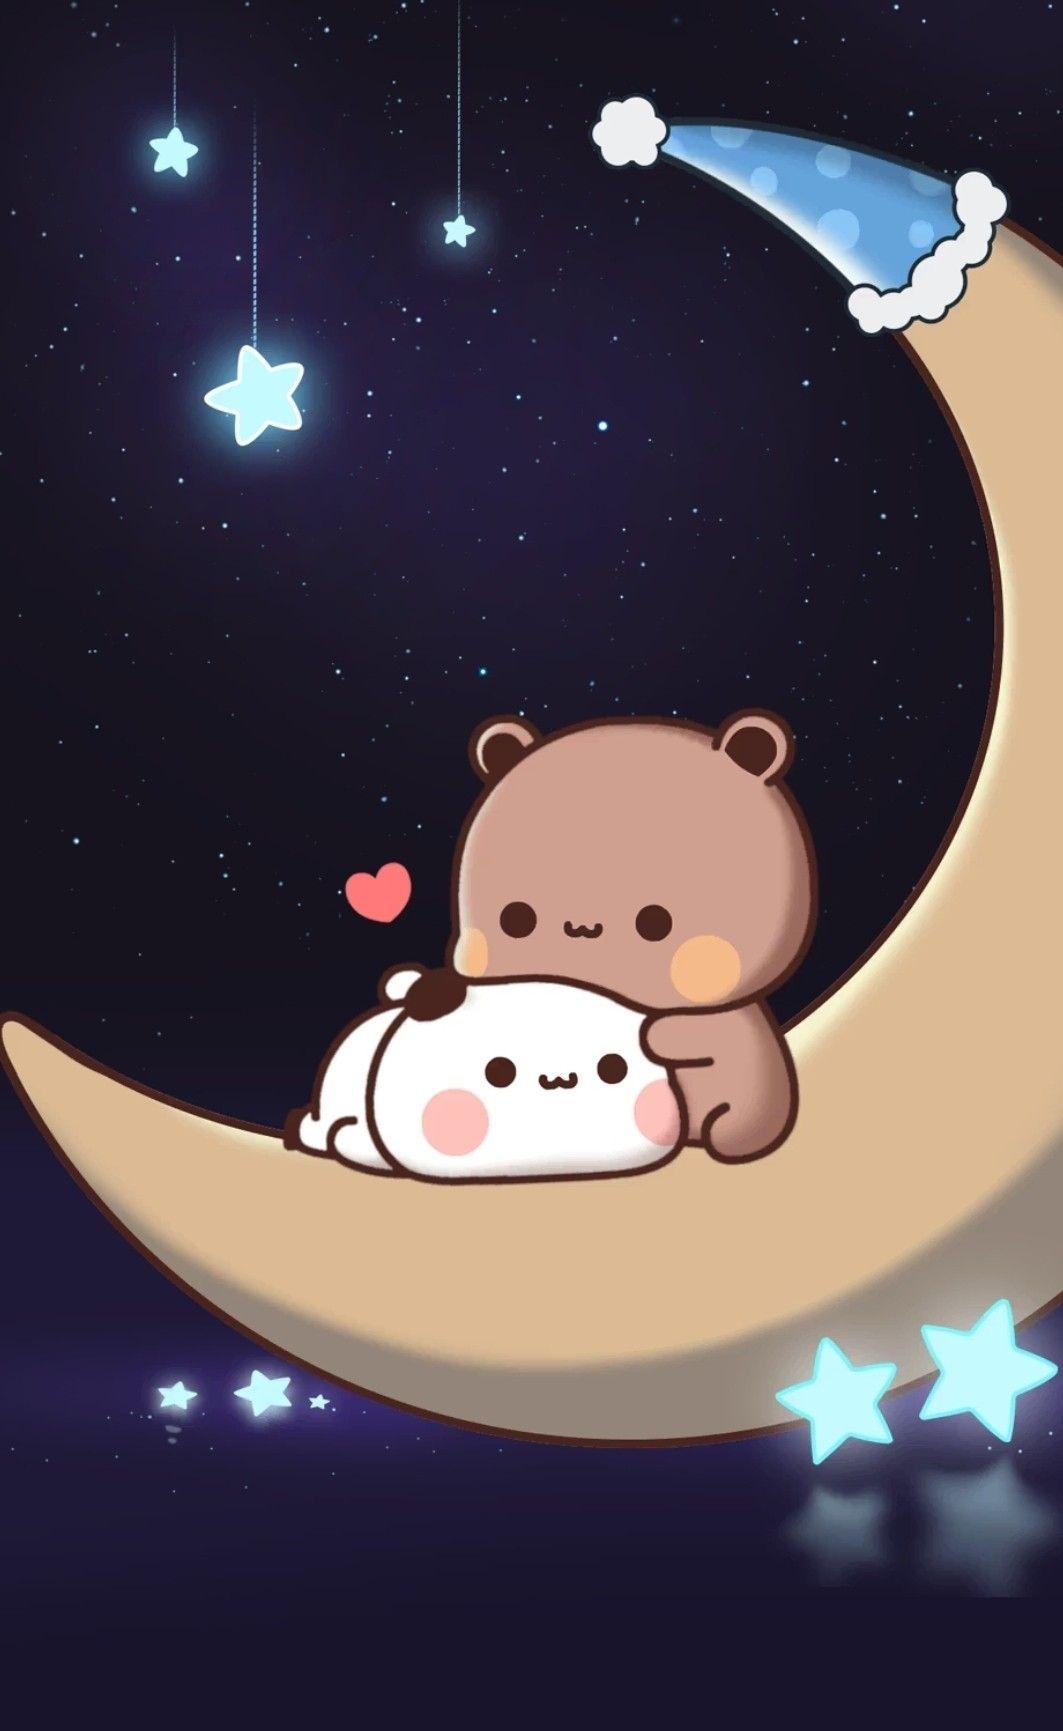 Pin By Karla Briones On Michi Et Boo Cute Panda Wallpaper Cute Wallpapers Cute Bear Drawings